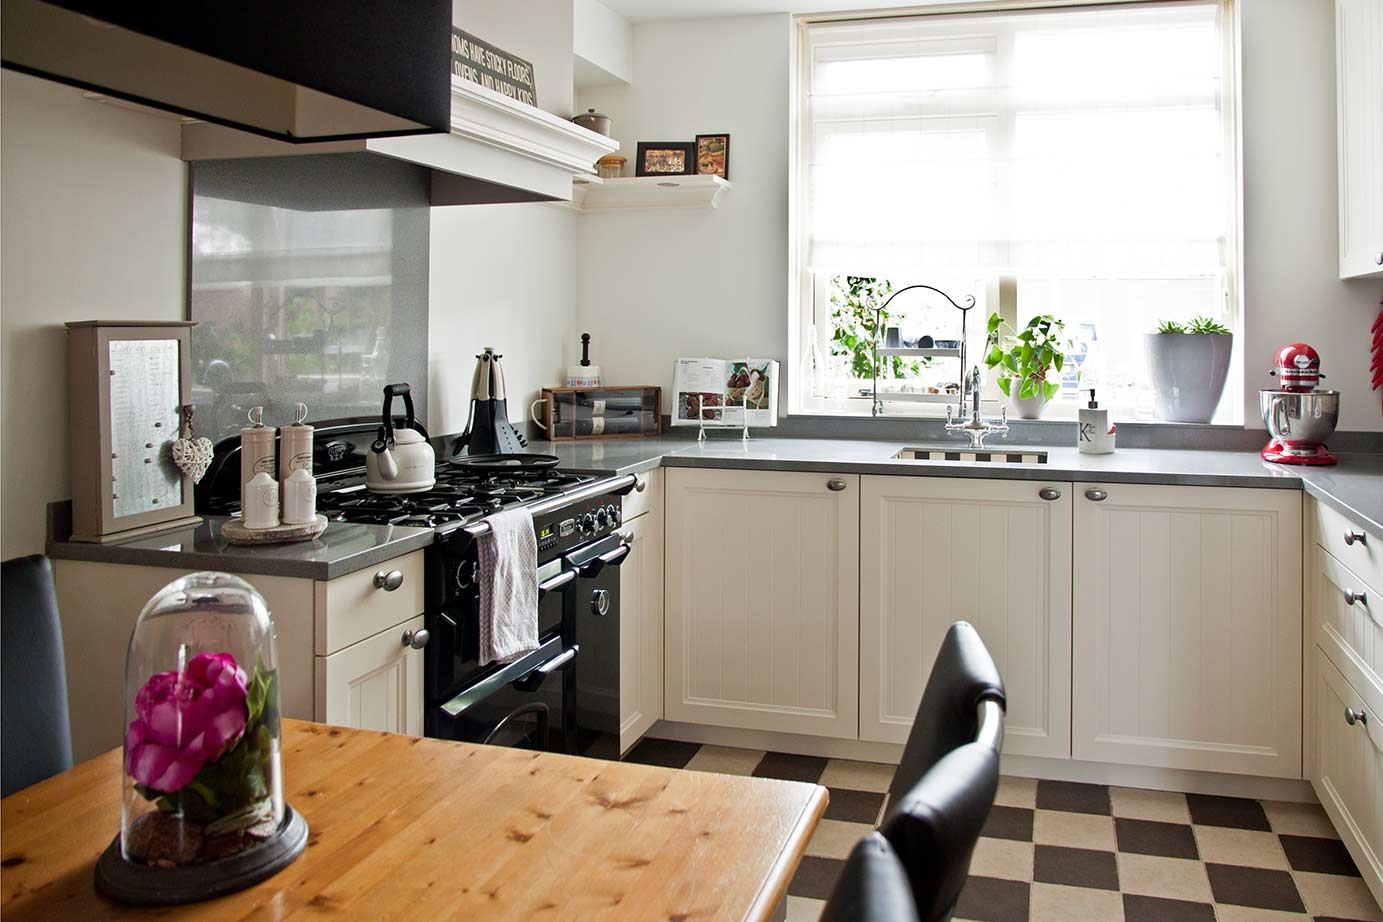 wandtegels keuken mozaiek : Wandtegels Keuken Landelijk Wandtegels Landelijke Keuken Tegel